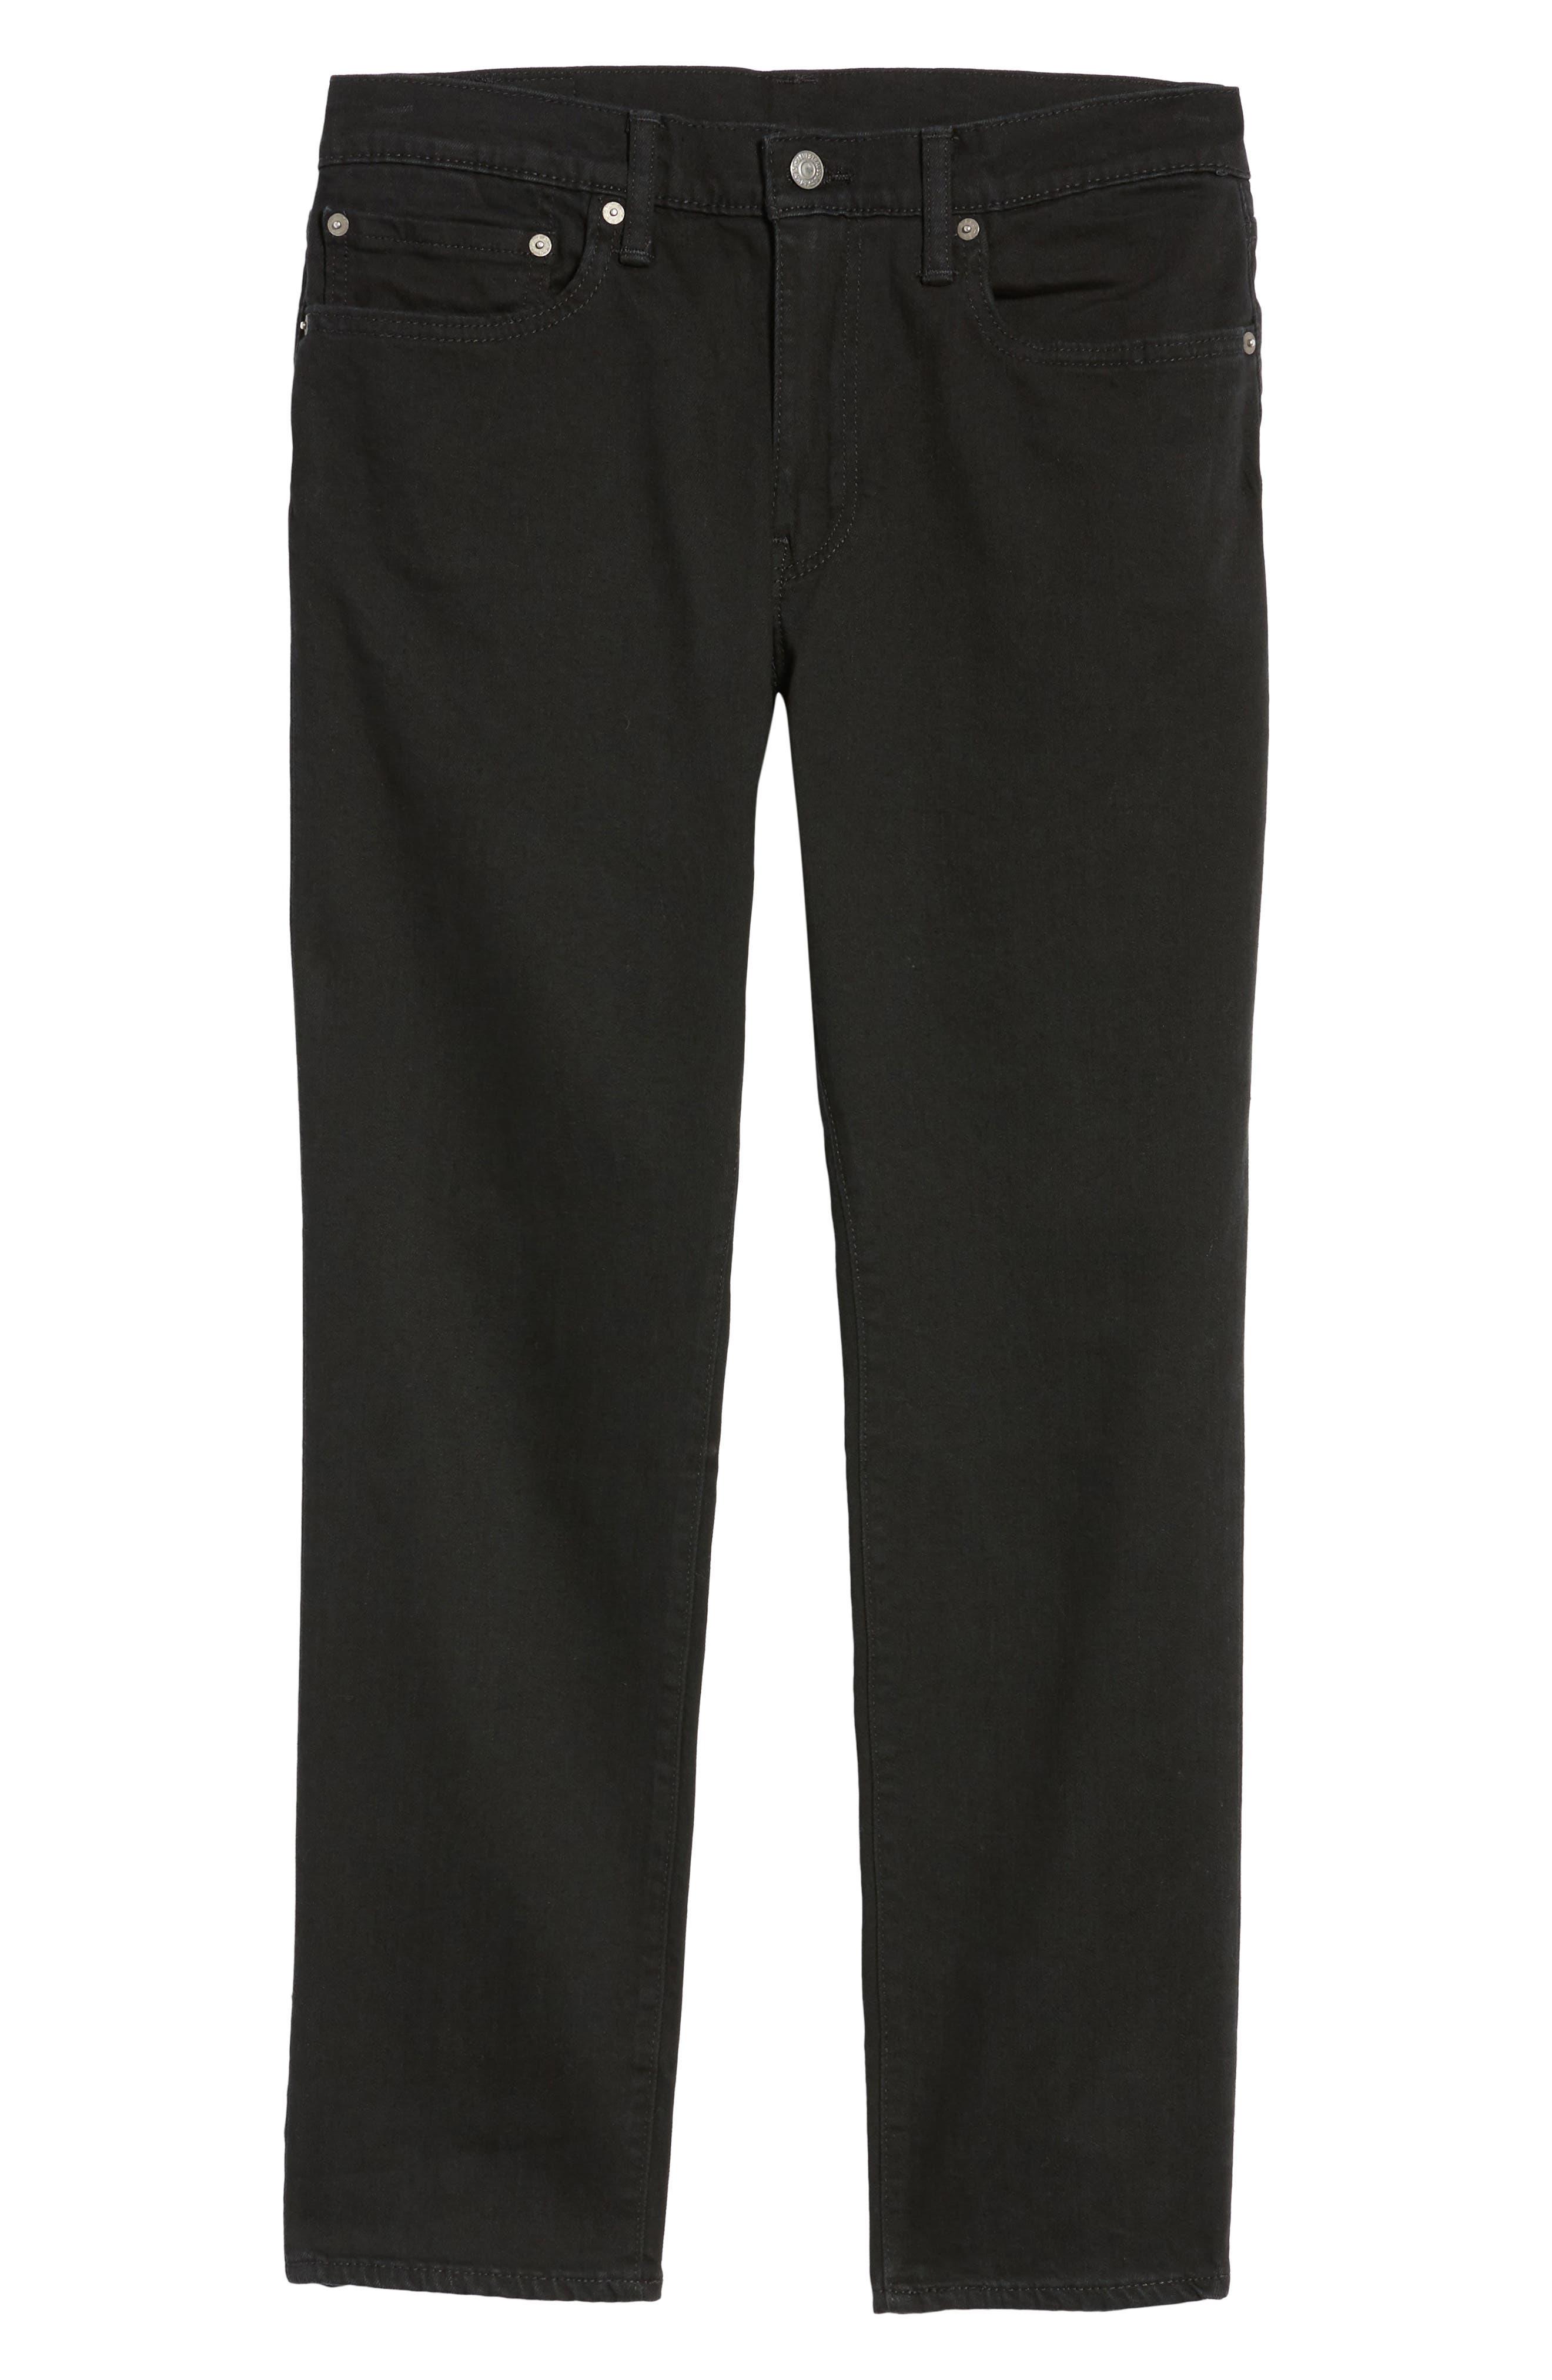 Men's Levi's 511(TM) Slim Fit Jeans